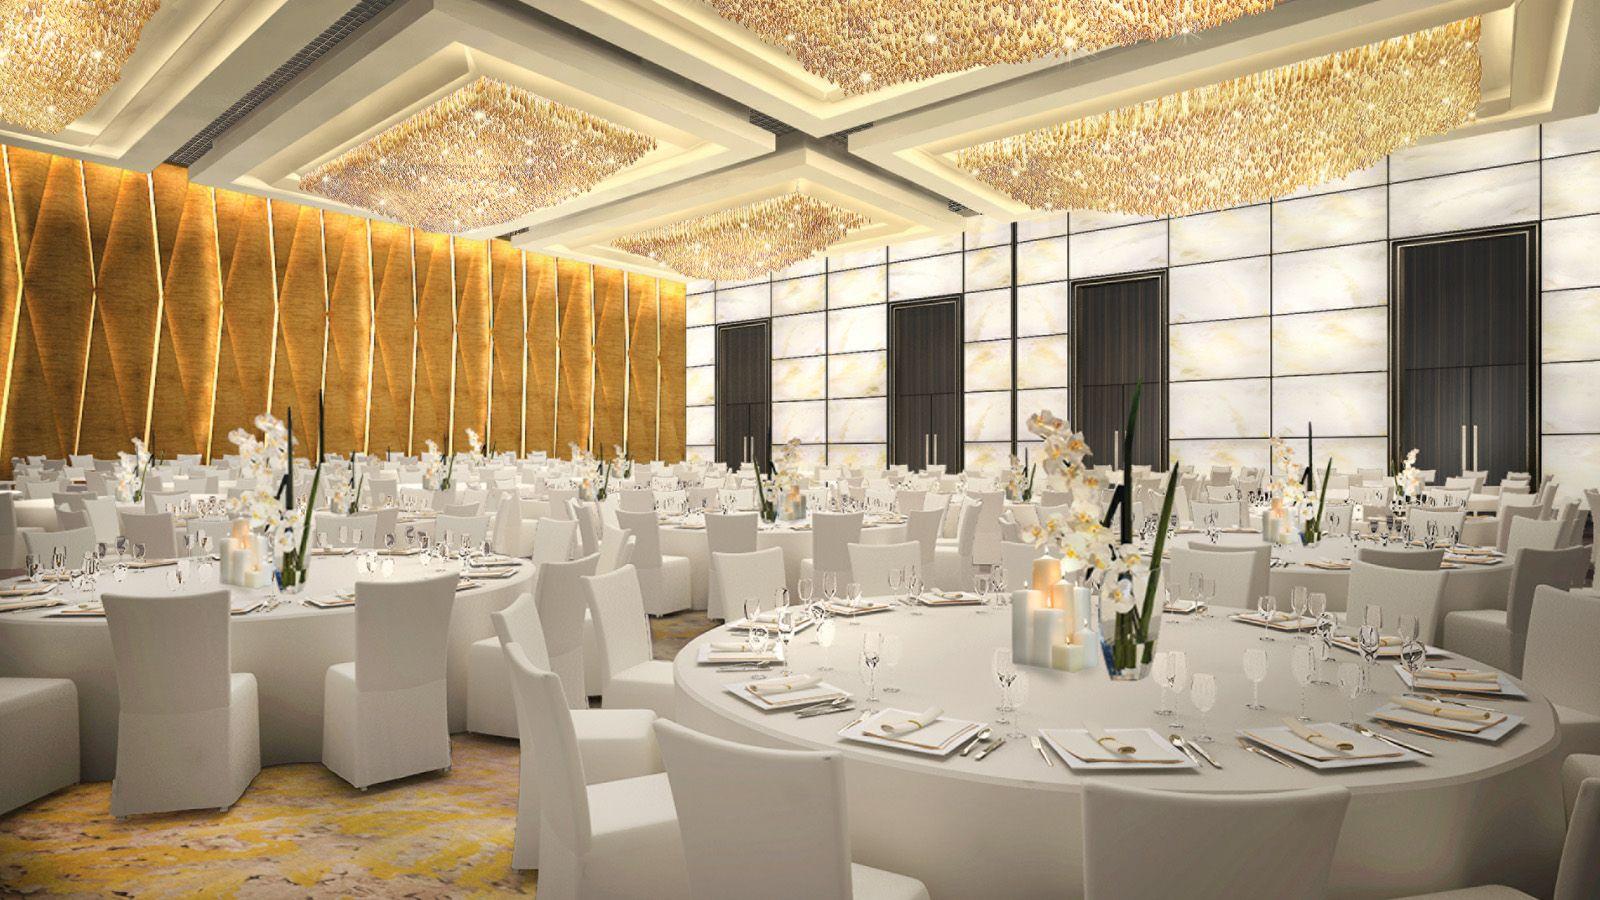 Image gallery modern ballroom for Design hotel wedding